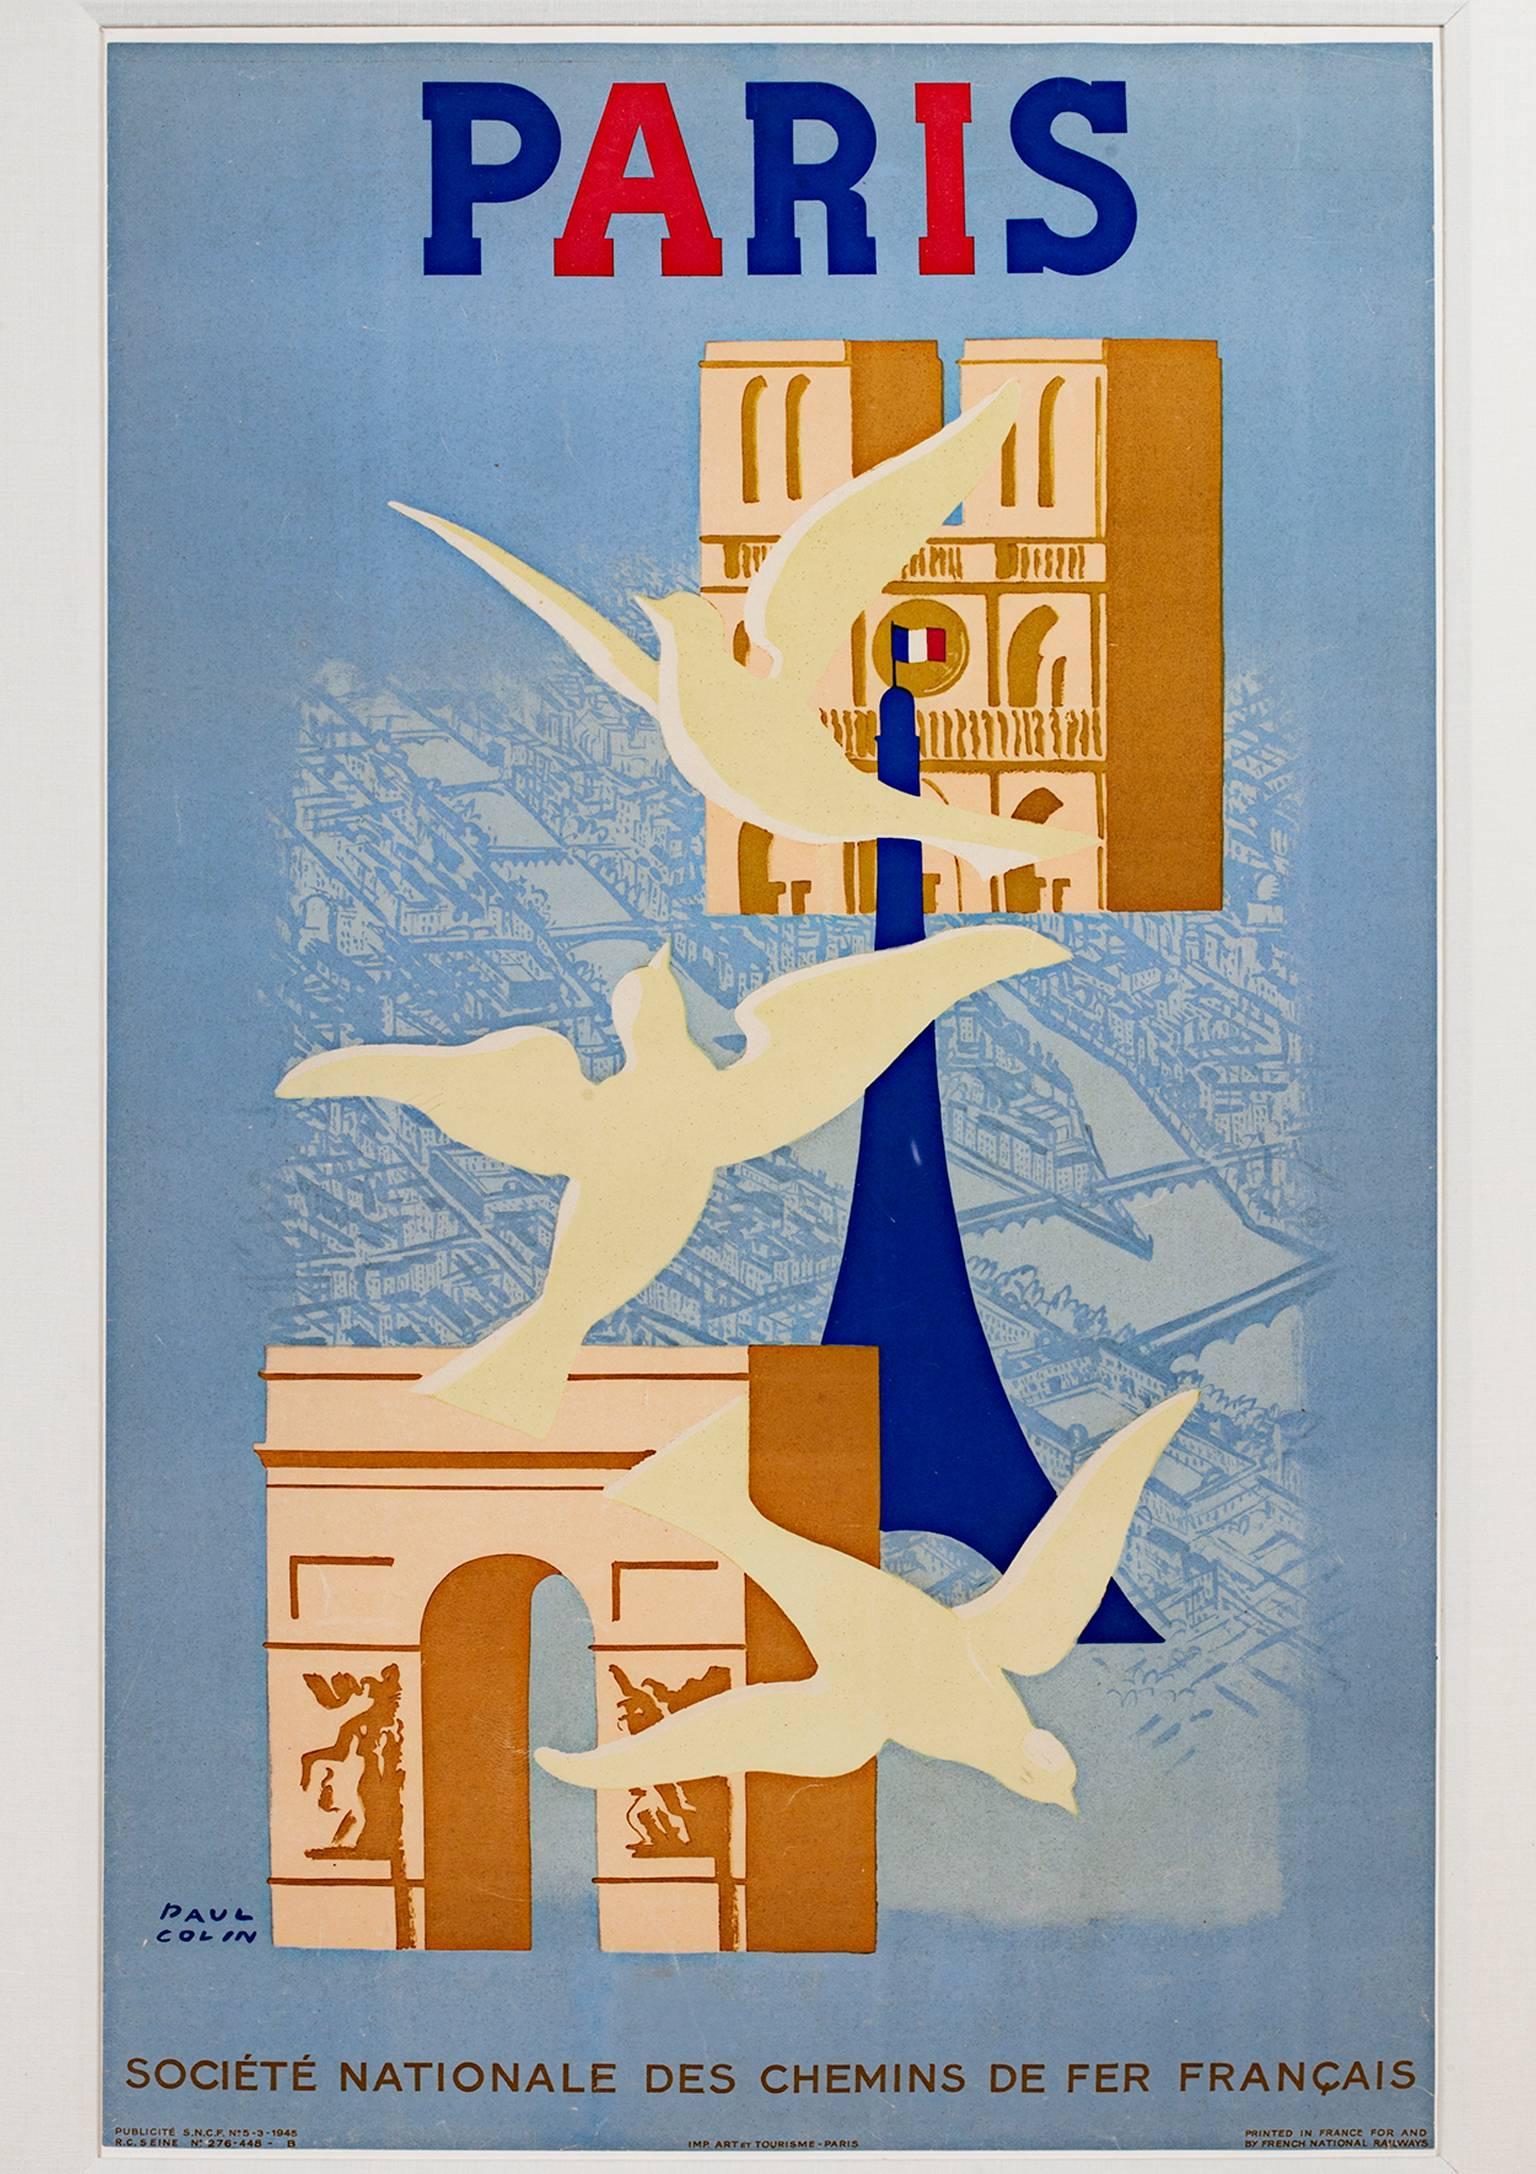 """Paris,"" Original Lithograph Poster with Paris Landmarks signed by Paul Colin"